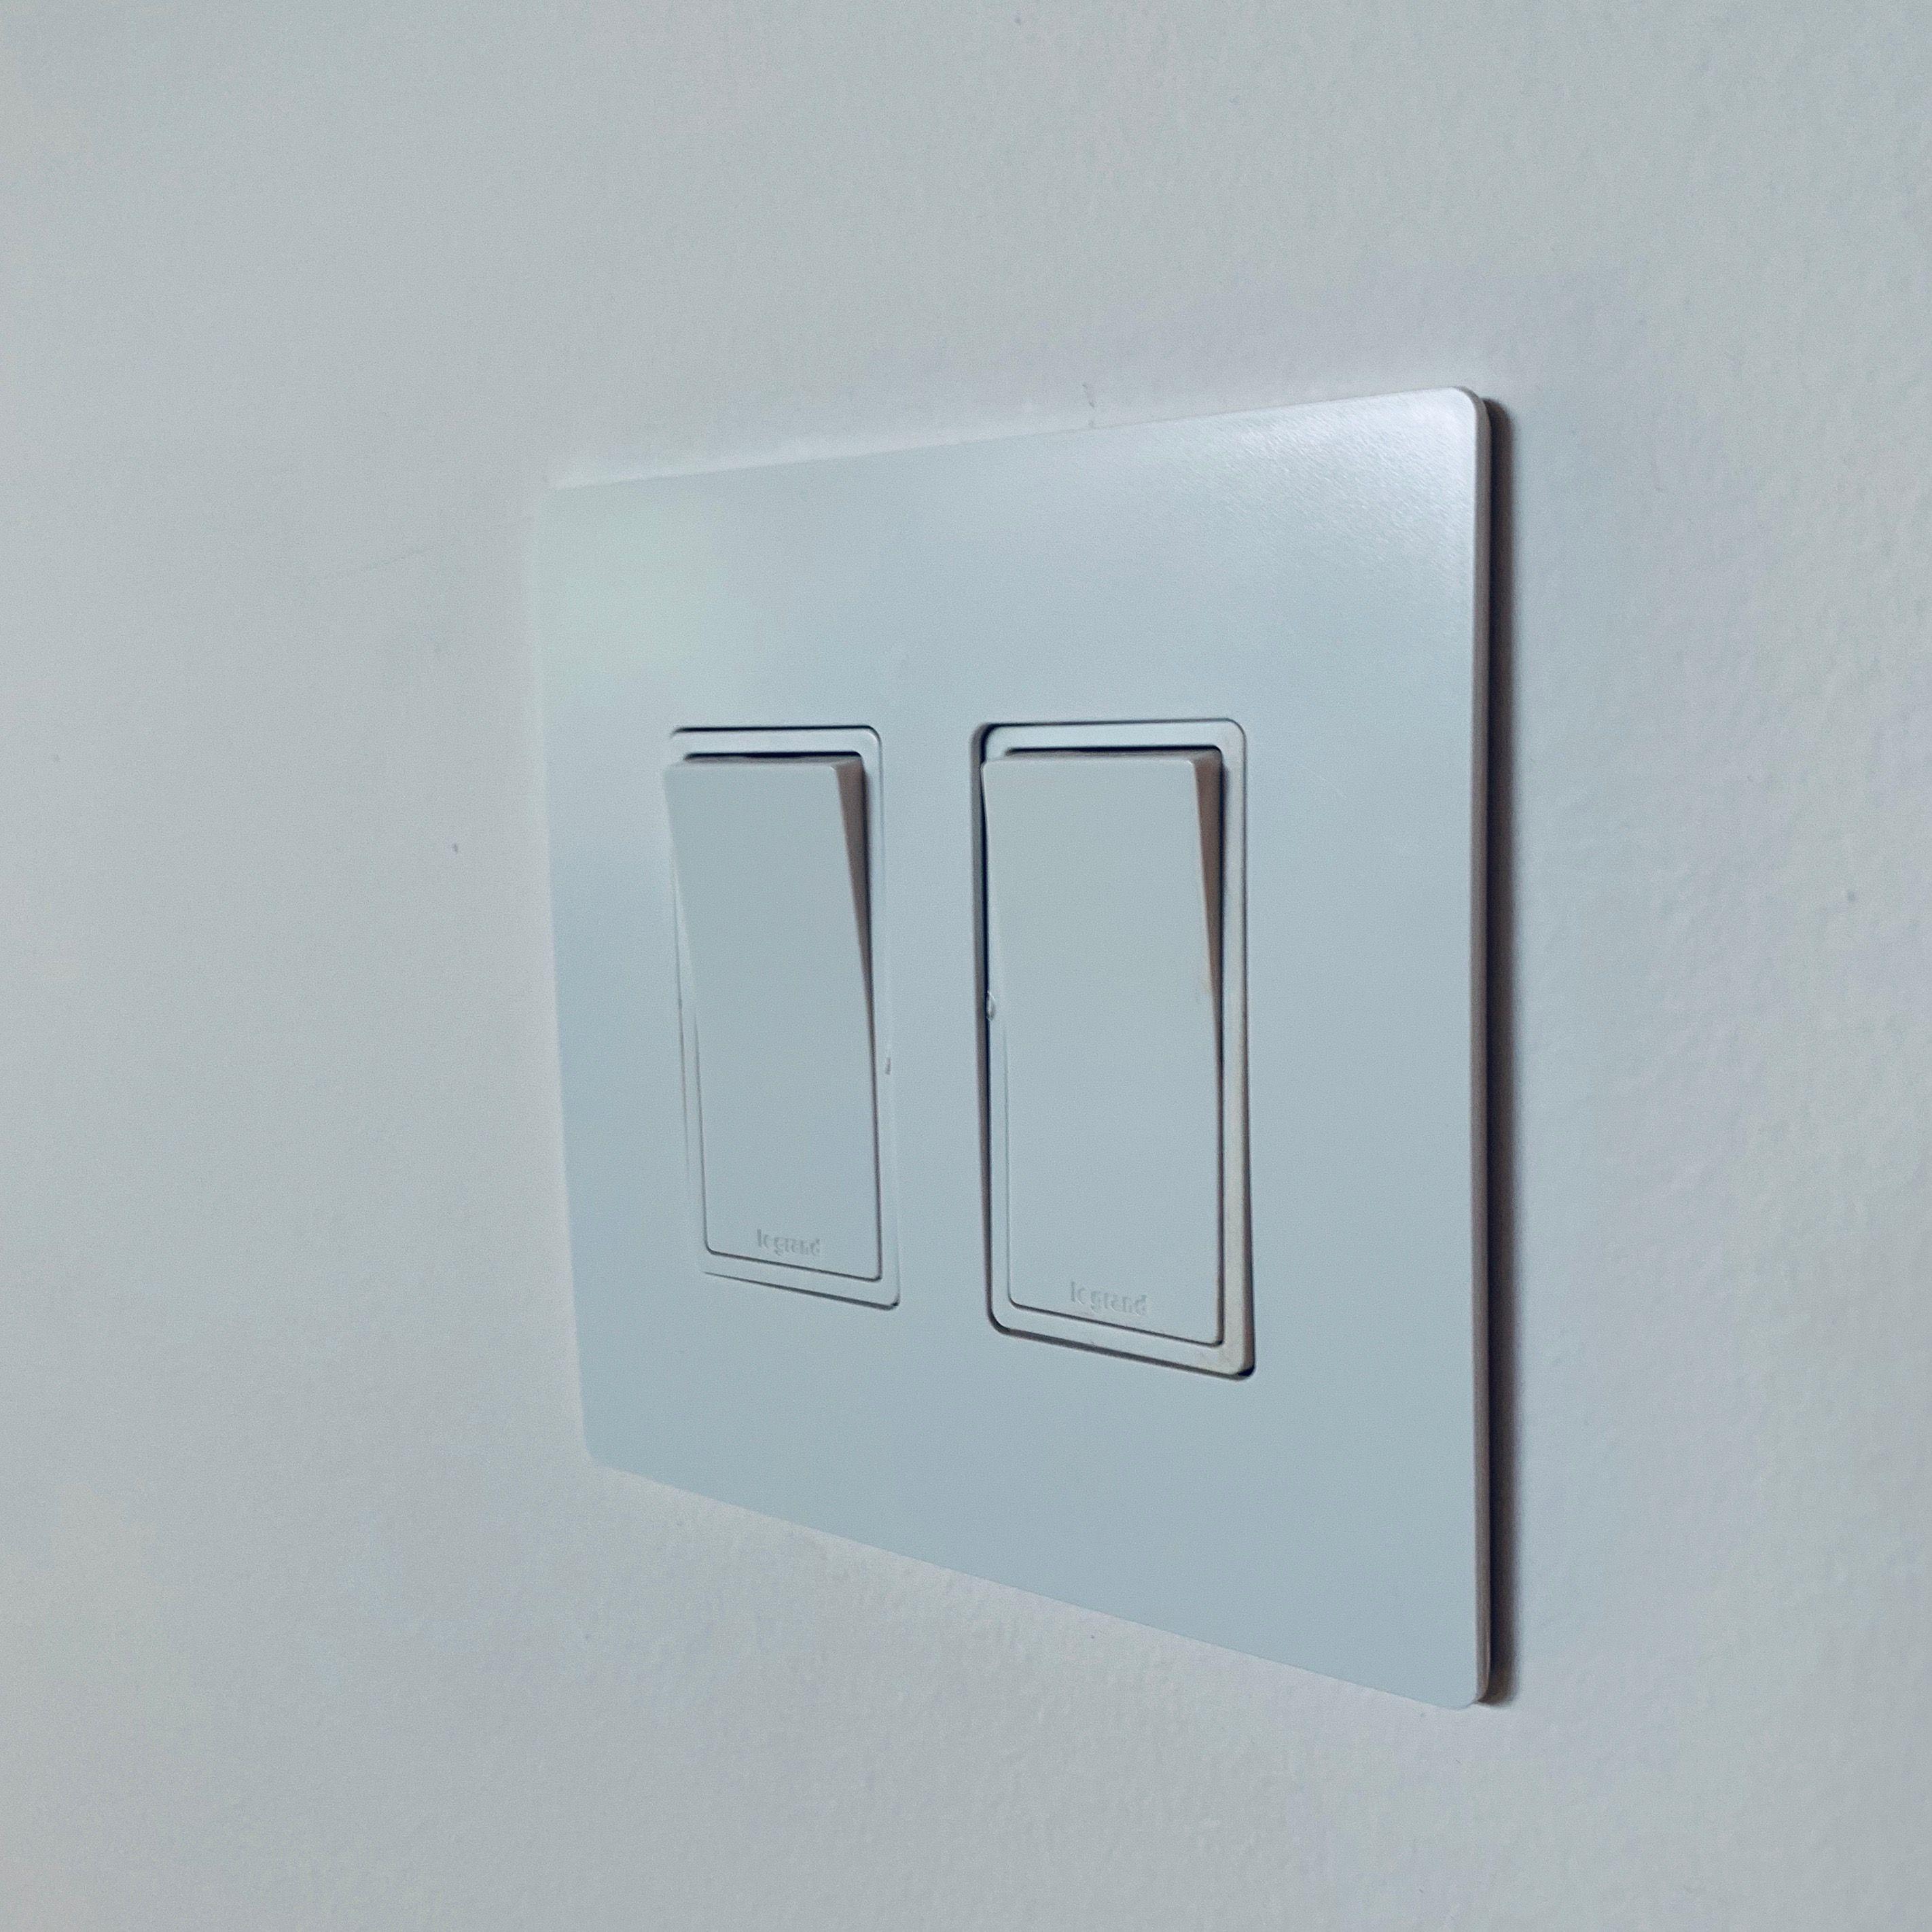 Legrand Screwless Wall Plate 2 Gang Switch Custom Home